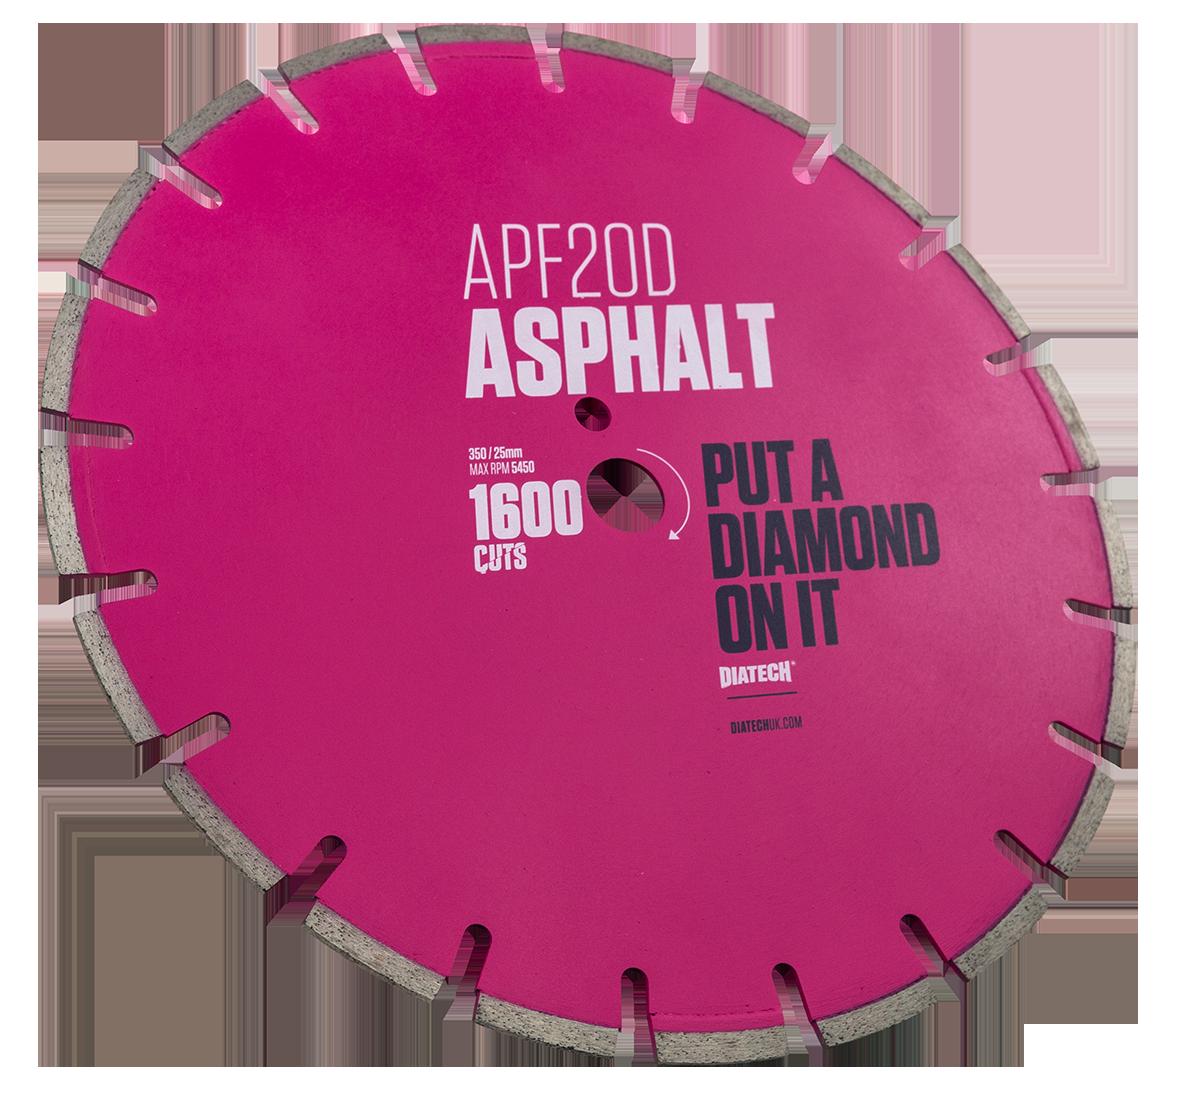 Cut Asphalt Blade APF20D